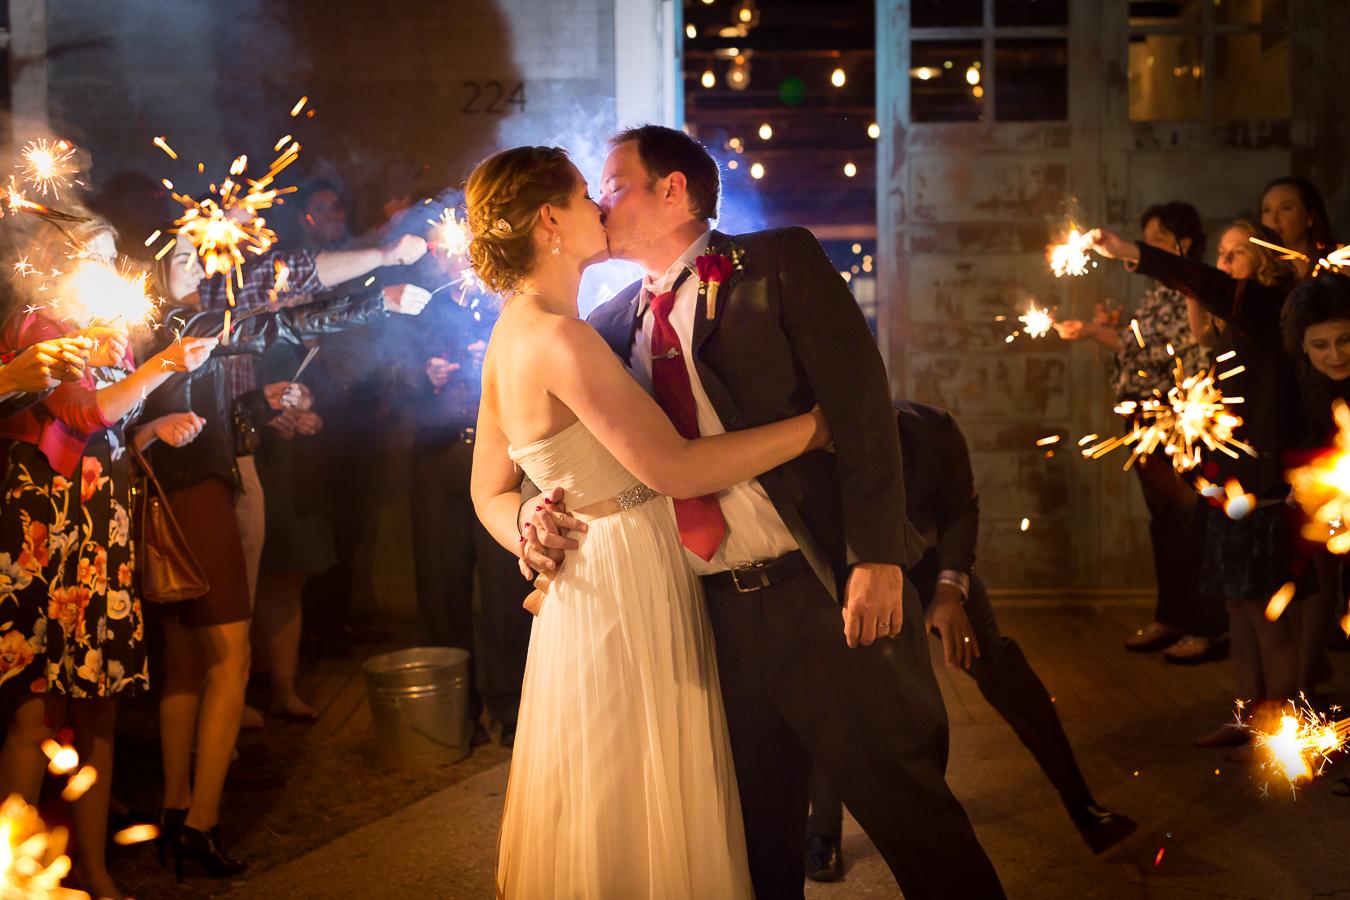 union-on-eighth-wedding-photographs-019.jpg